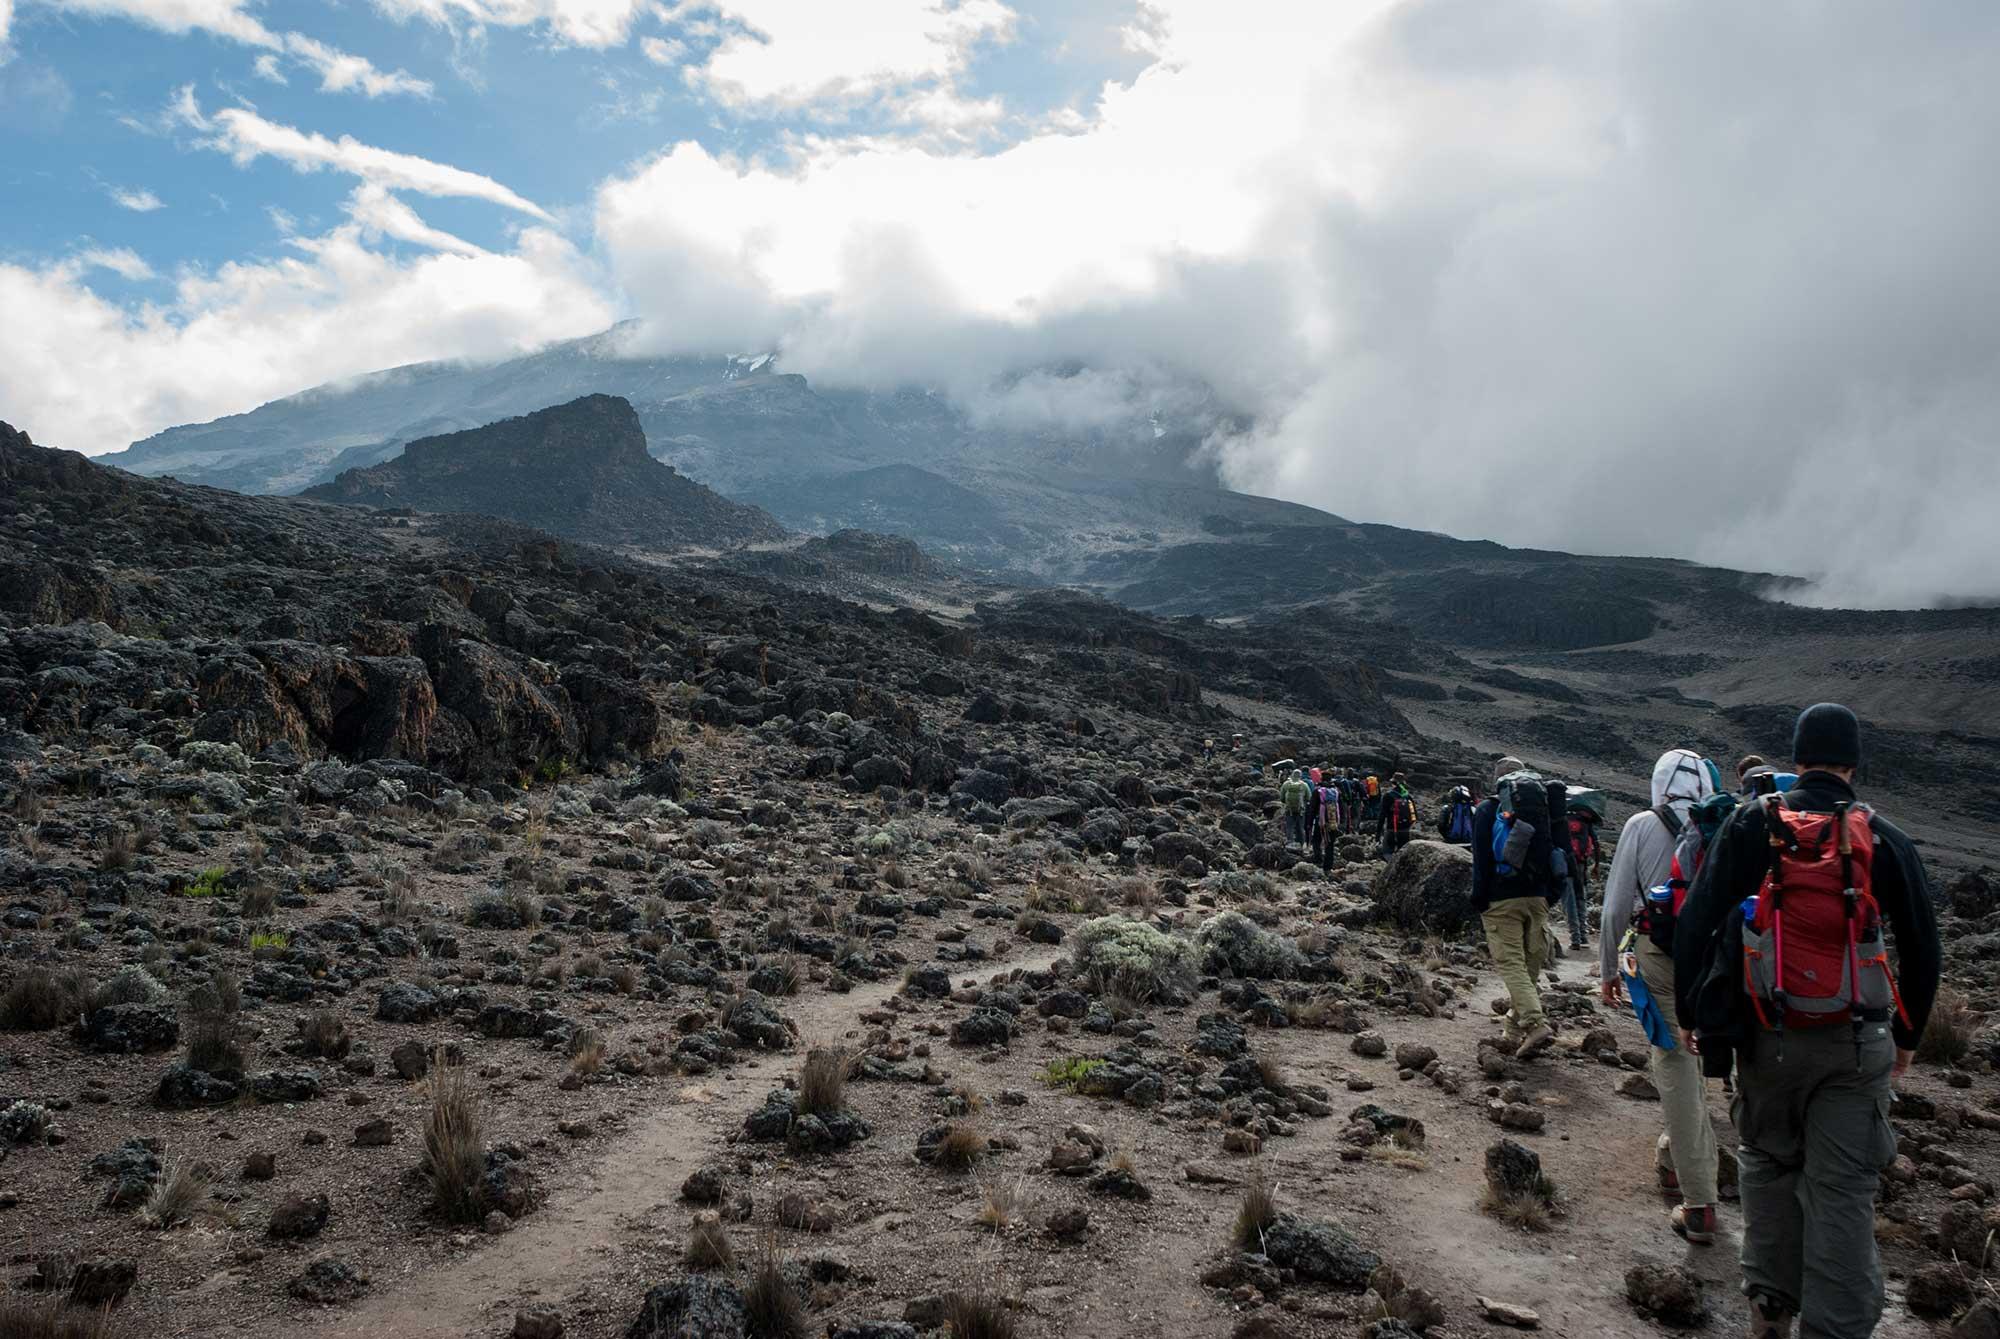 D4-04-hiking-into-bad-weather-kilimanjaro.jpg